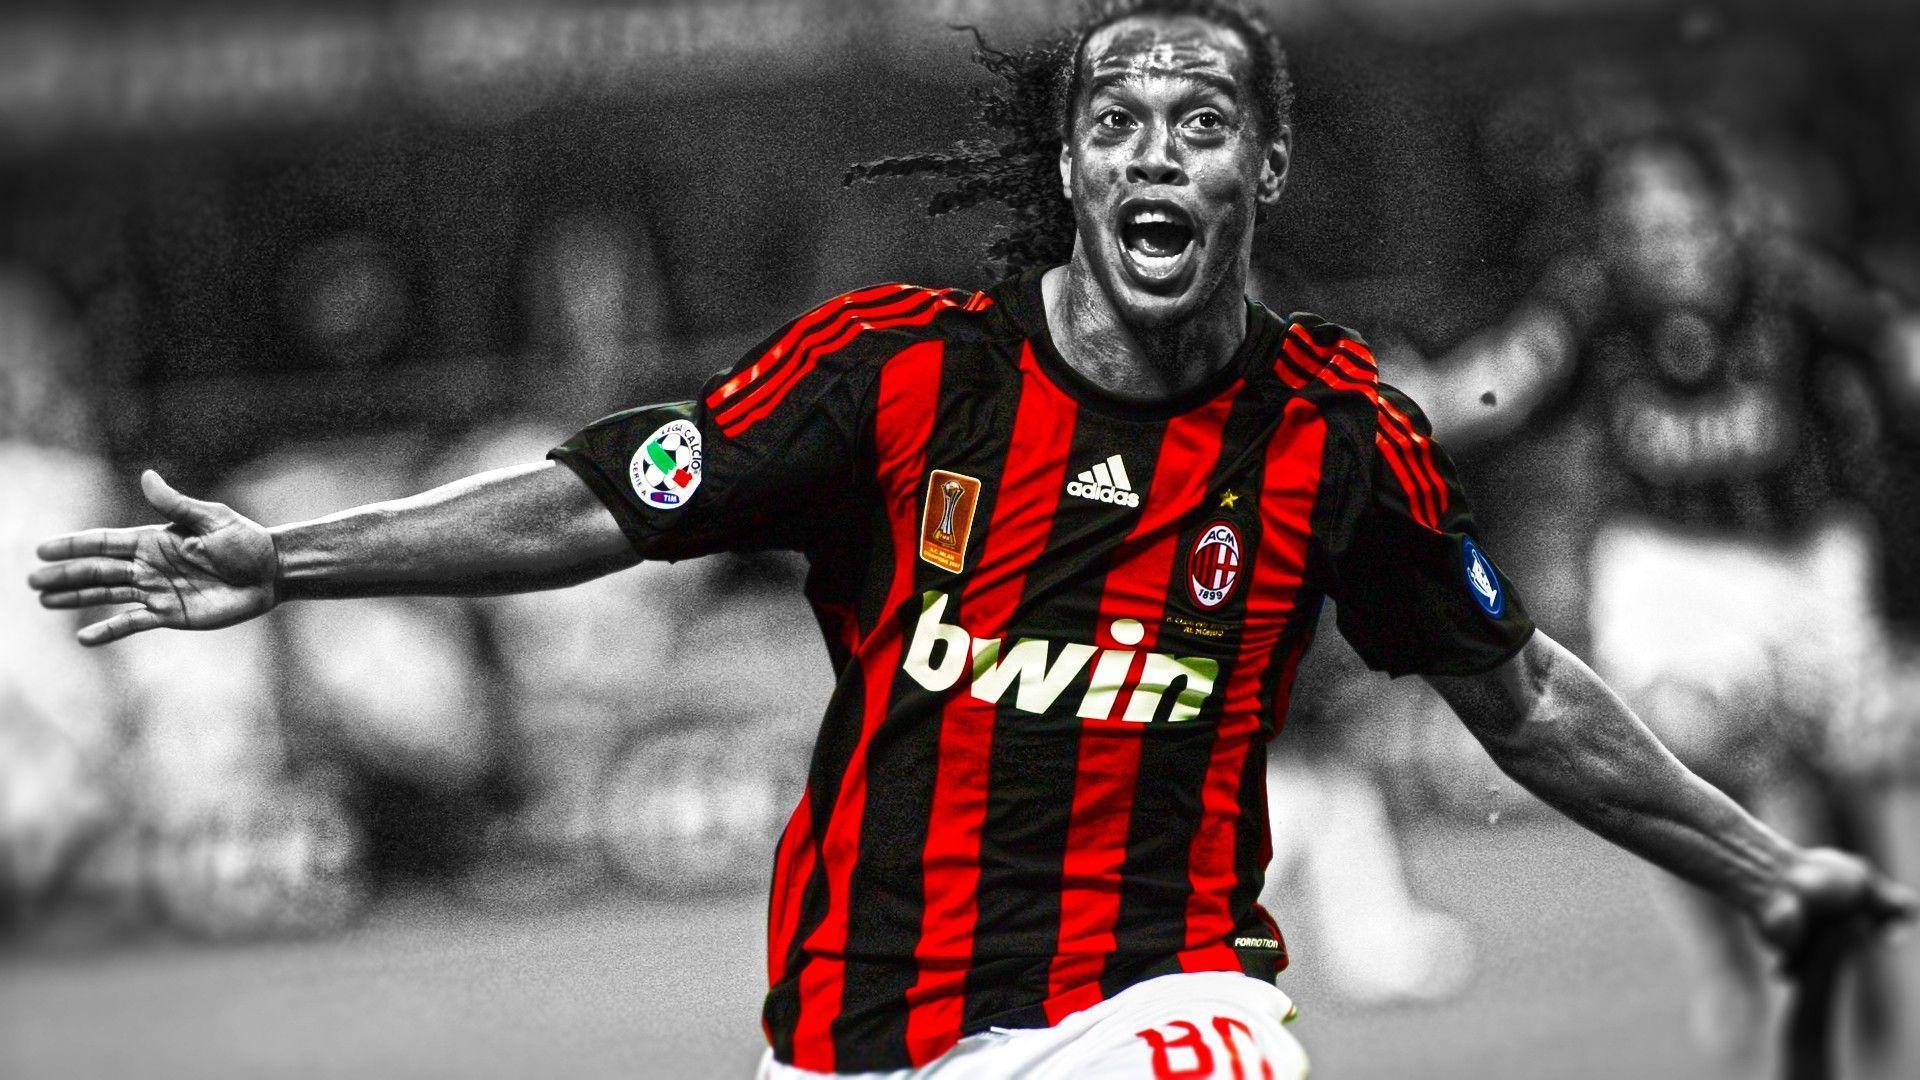 Ronaldinho 2018 Wallpapers Wallpaper Cave